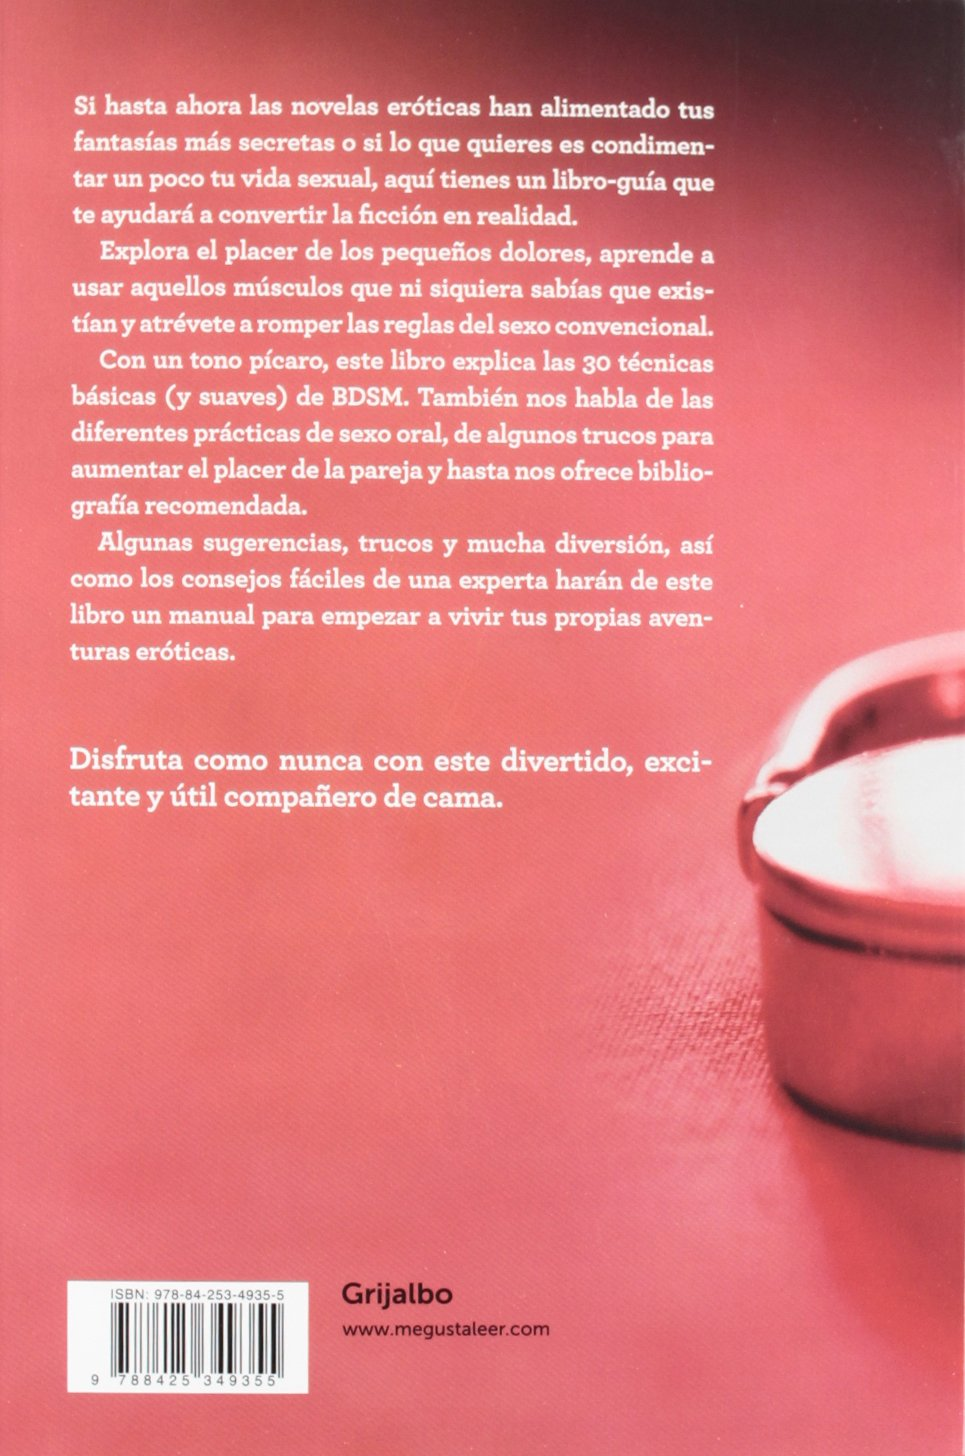 Cincuenta Sombras De Placer (Spanish Edition): Marisa Bennett: 9788425349355: Amazon.com: Books